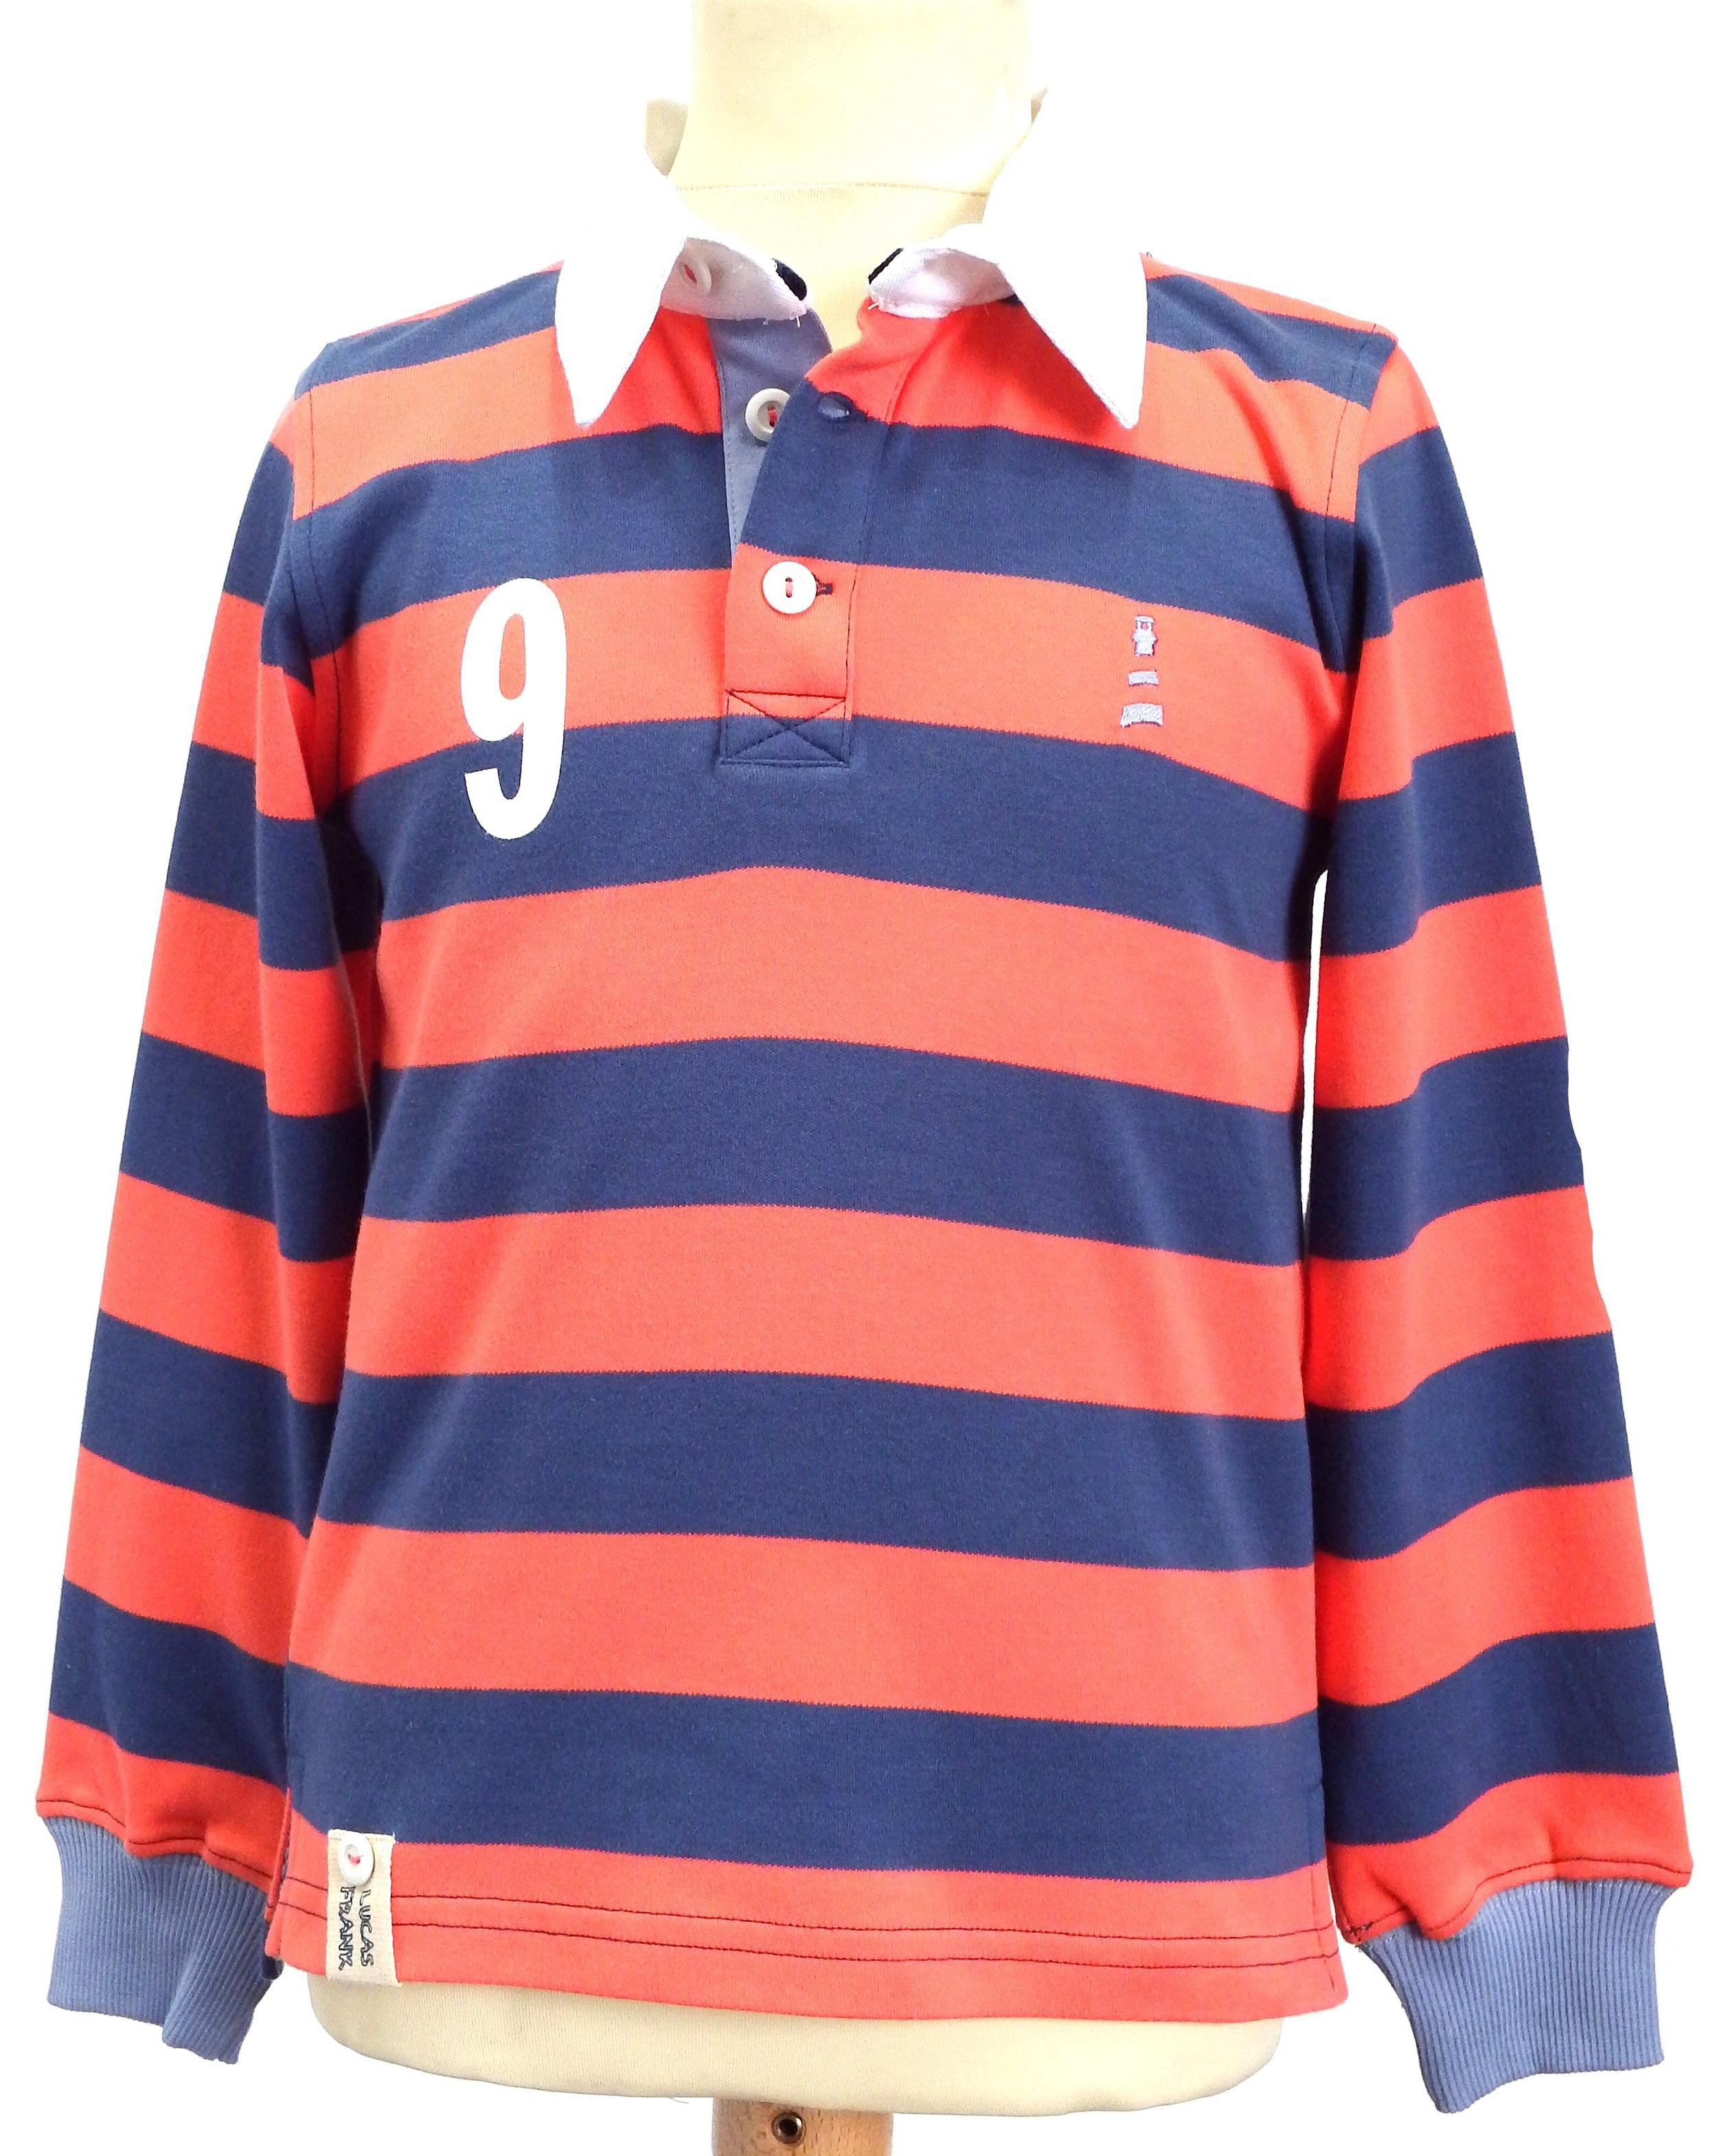 Carmanah Rugby Shirt£40